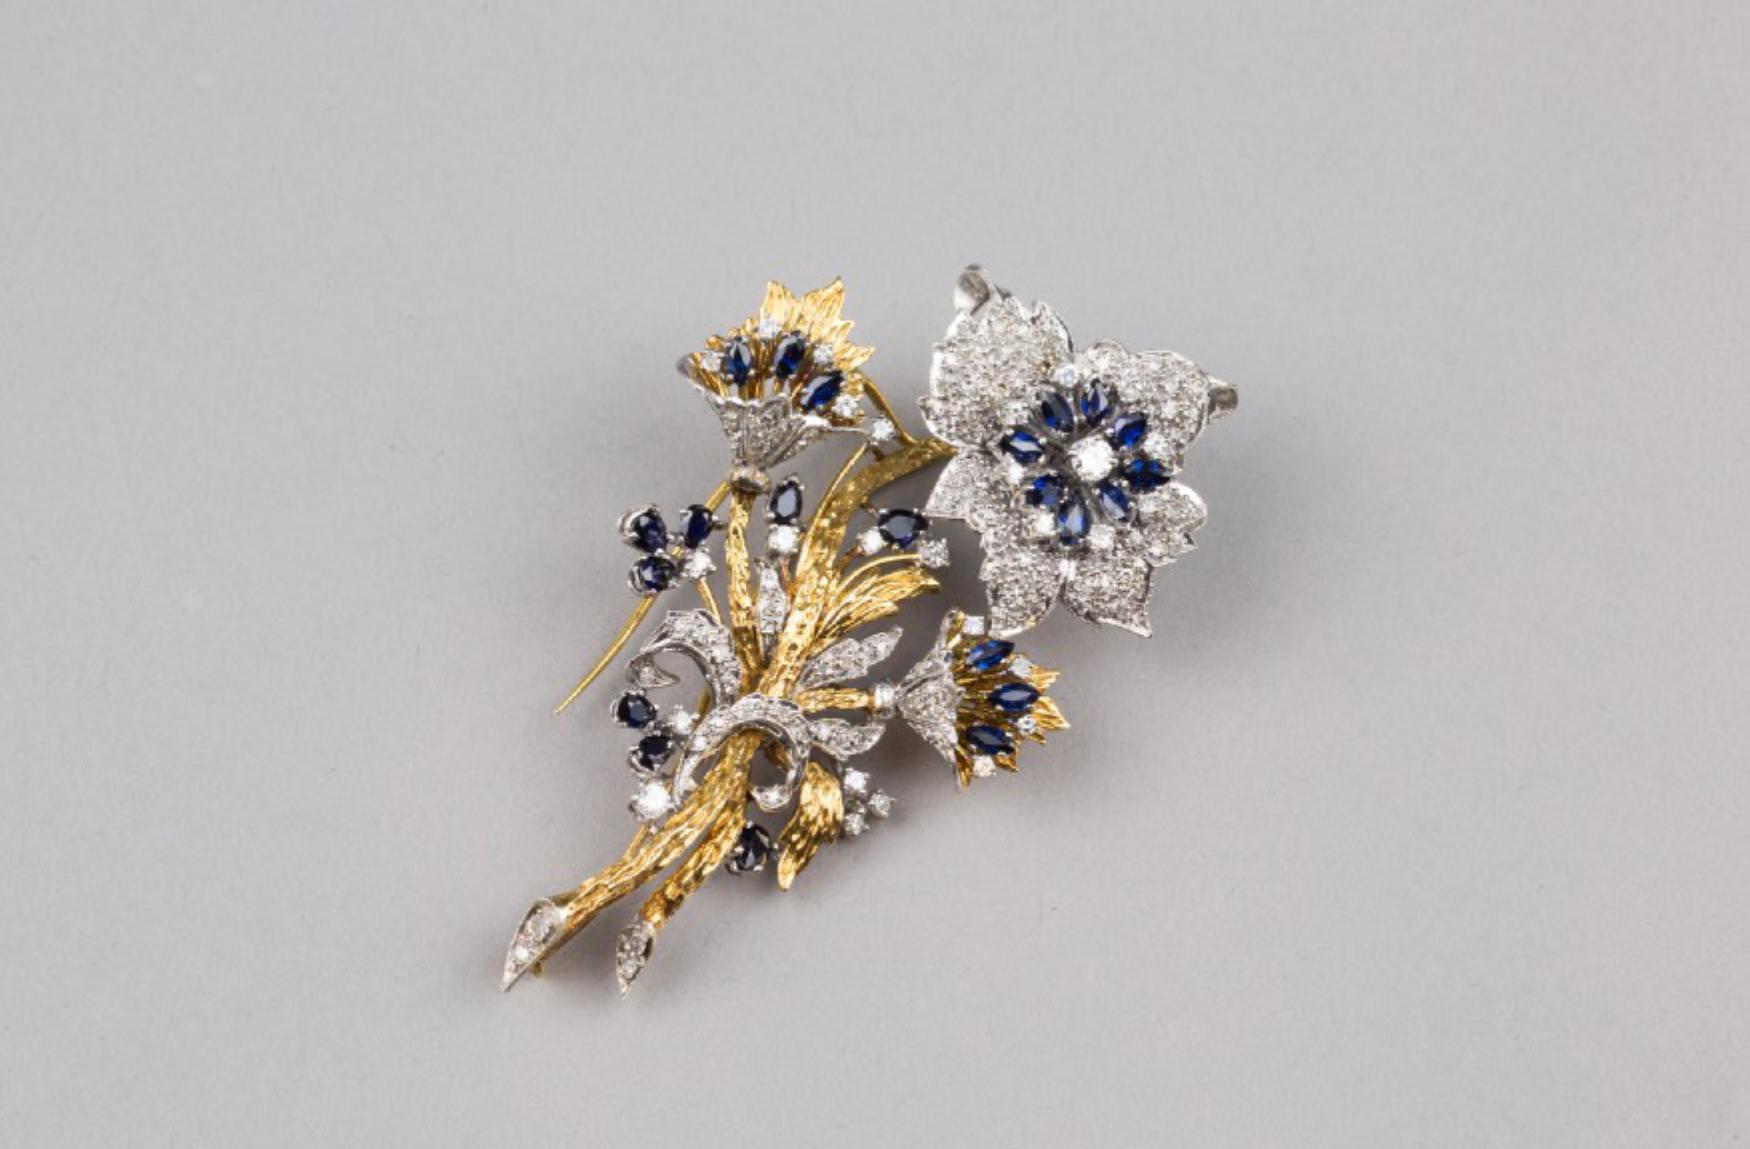 Lot 50 - A 18K Gold Sapphire and Diamond Brooch